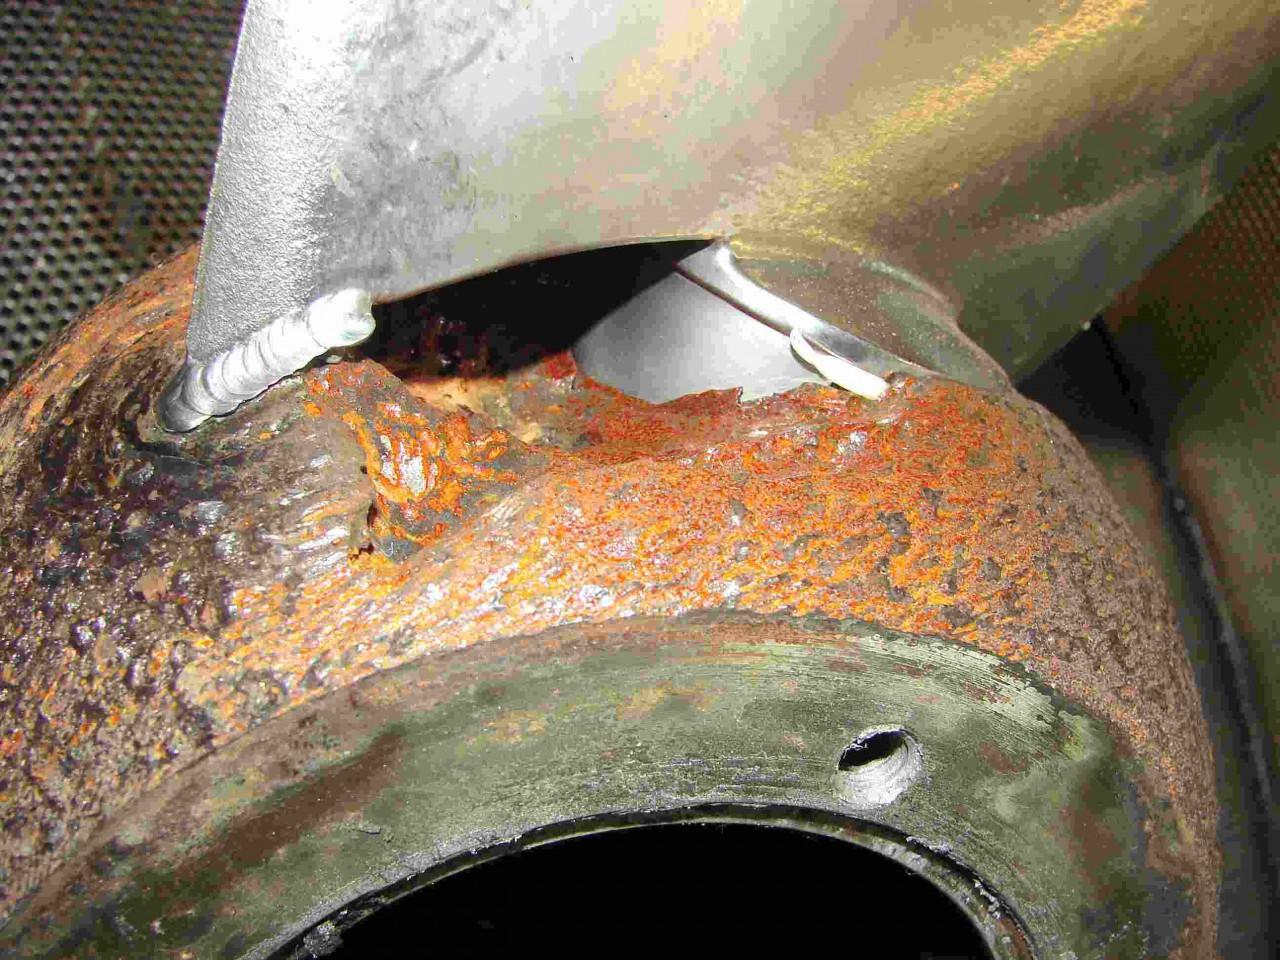 Korrosion Von Aluminium : Kontaktkorrosion